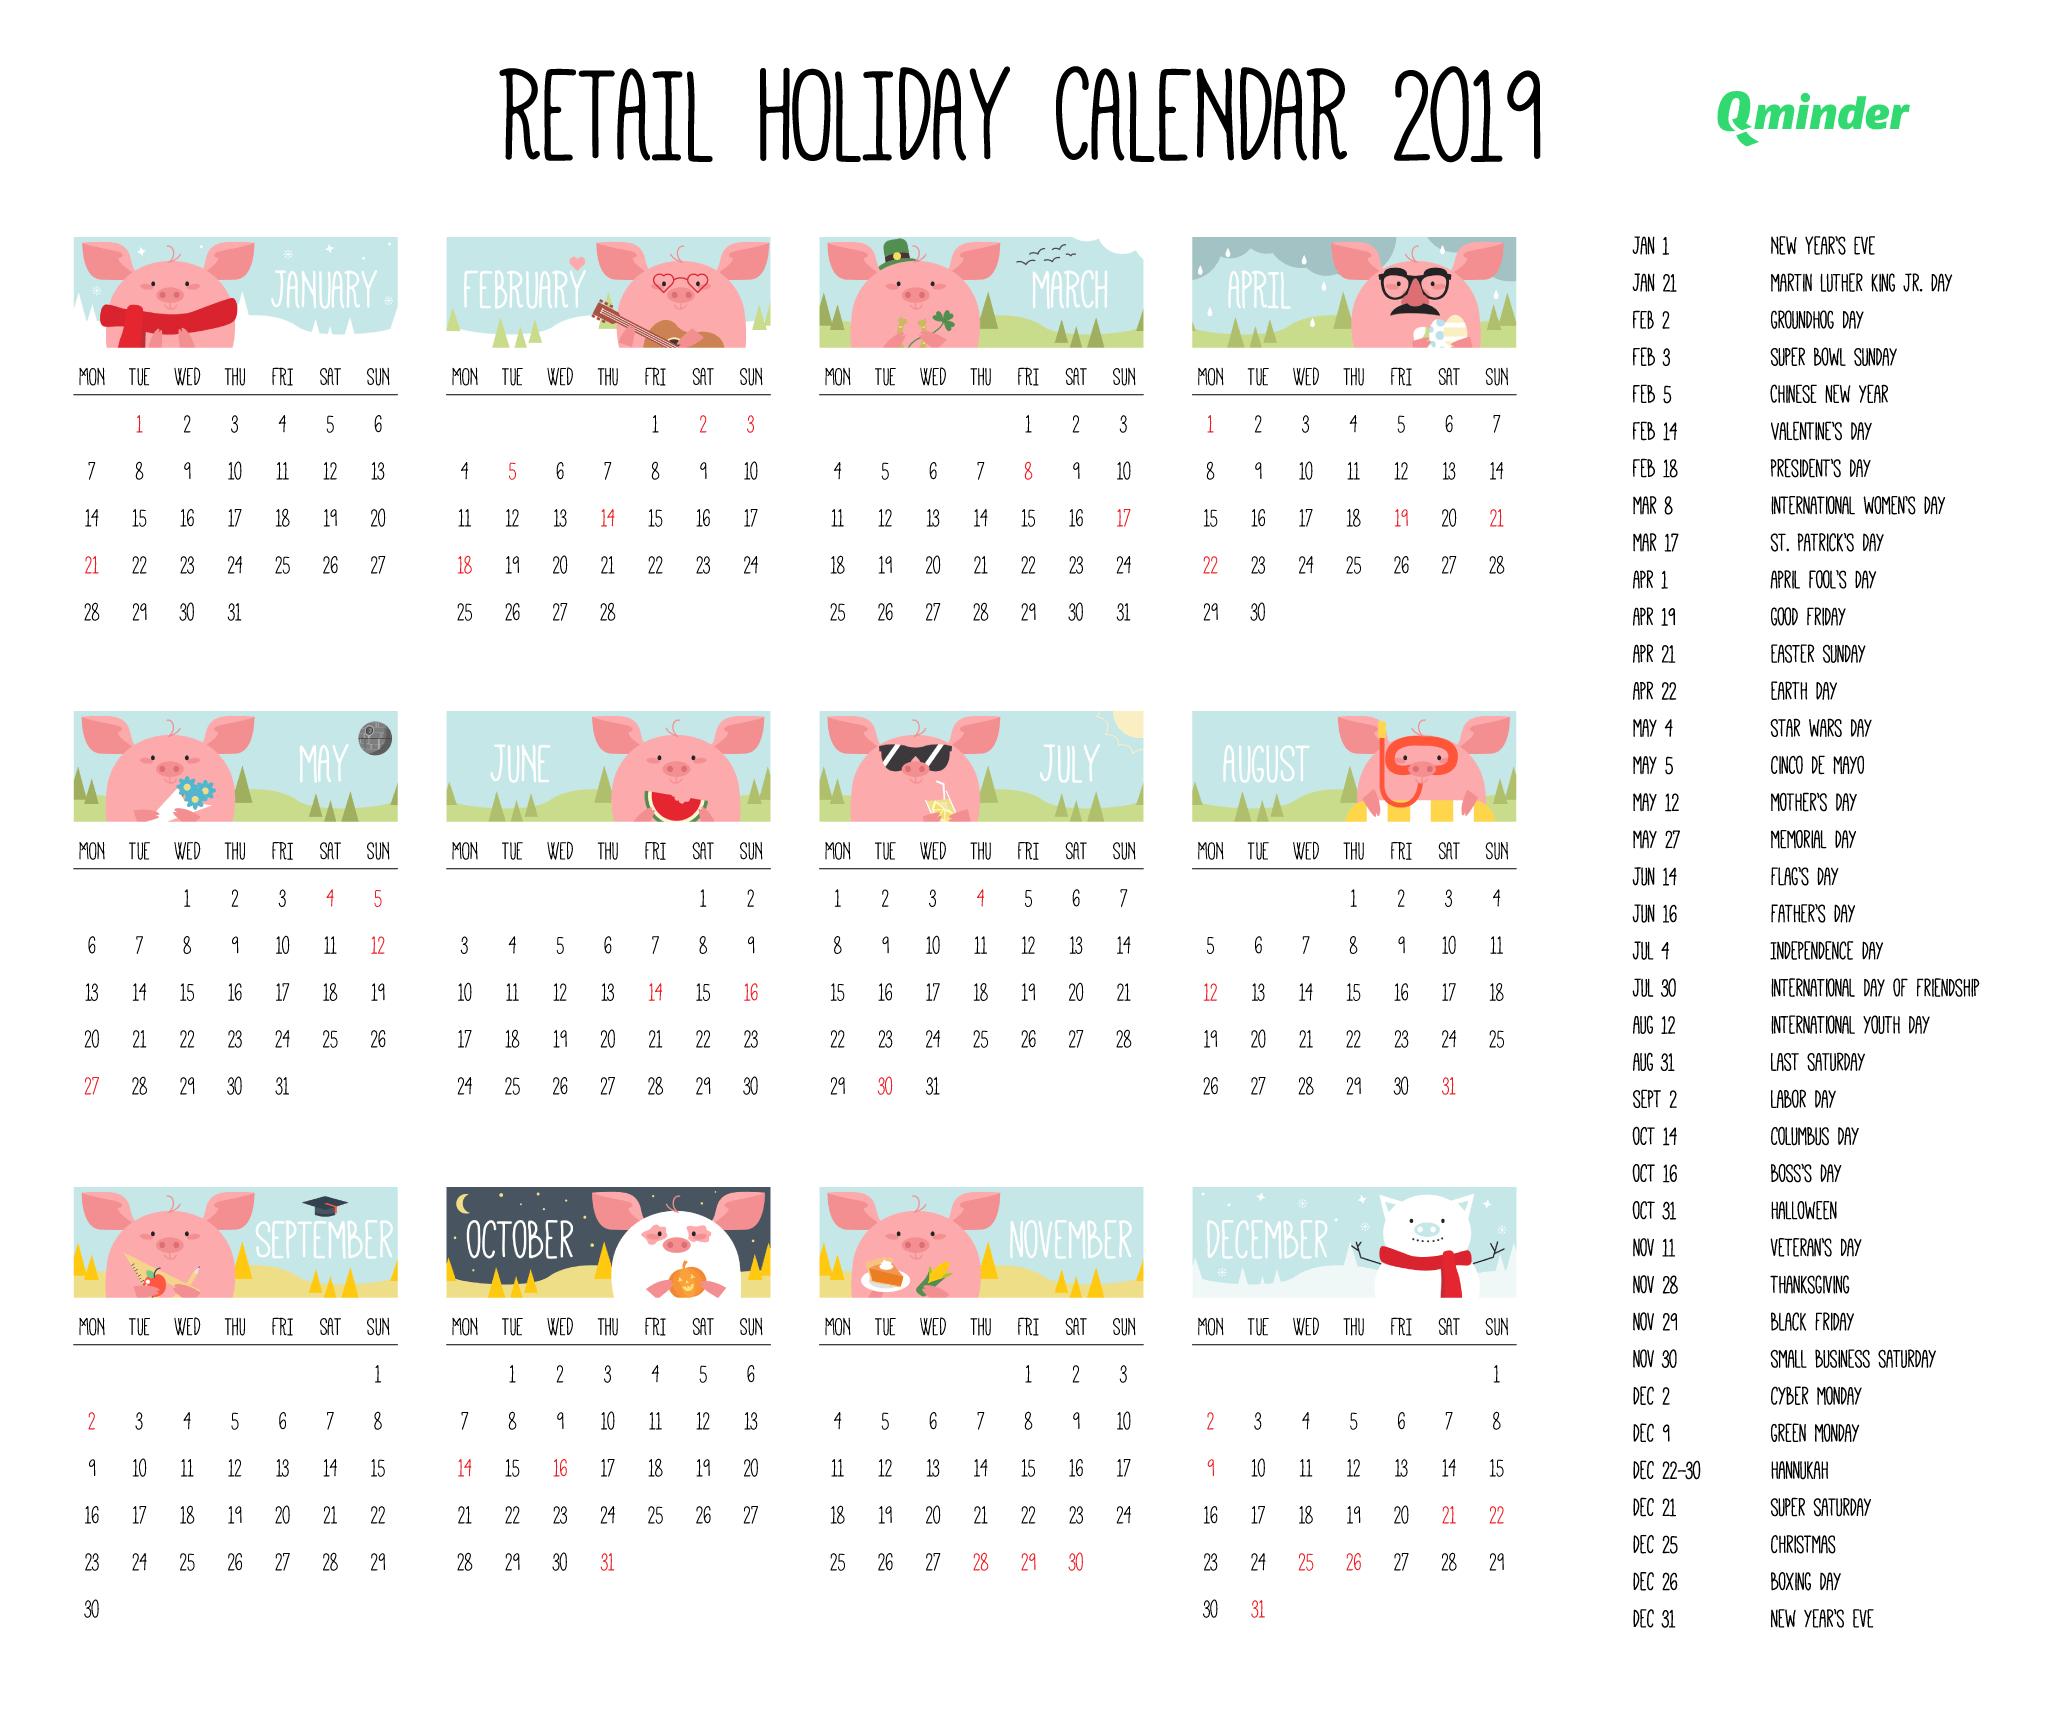 2019 Retail Holiday Calendar | Qminder Calendar E N 2019